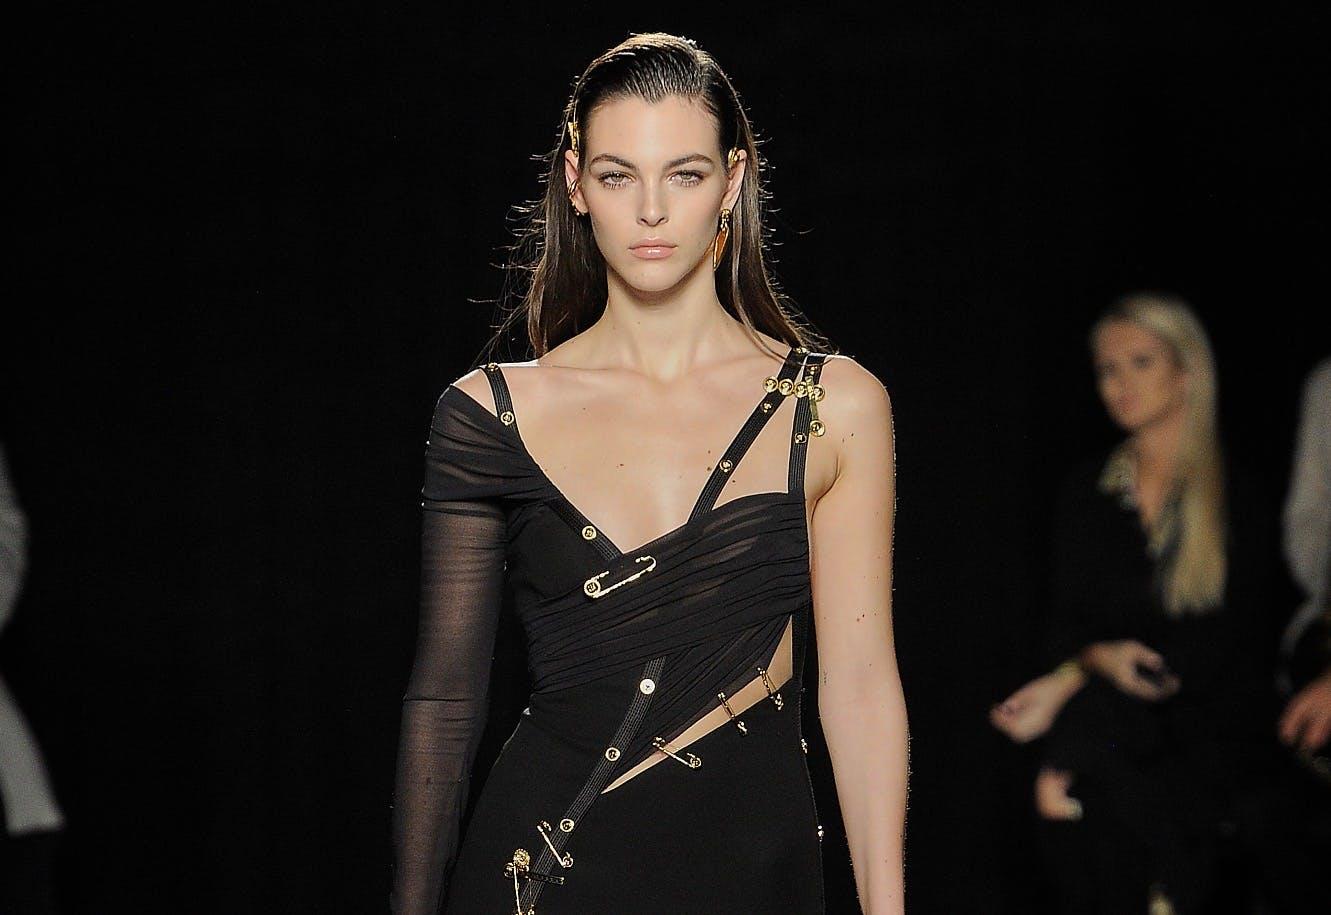 Versace Recreates Liz Hurley and J.Lo's Iconic Red Carpet Dresses